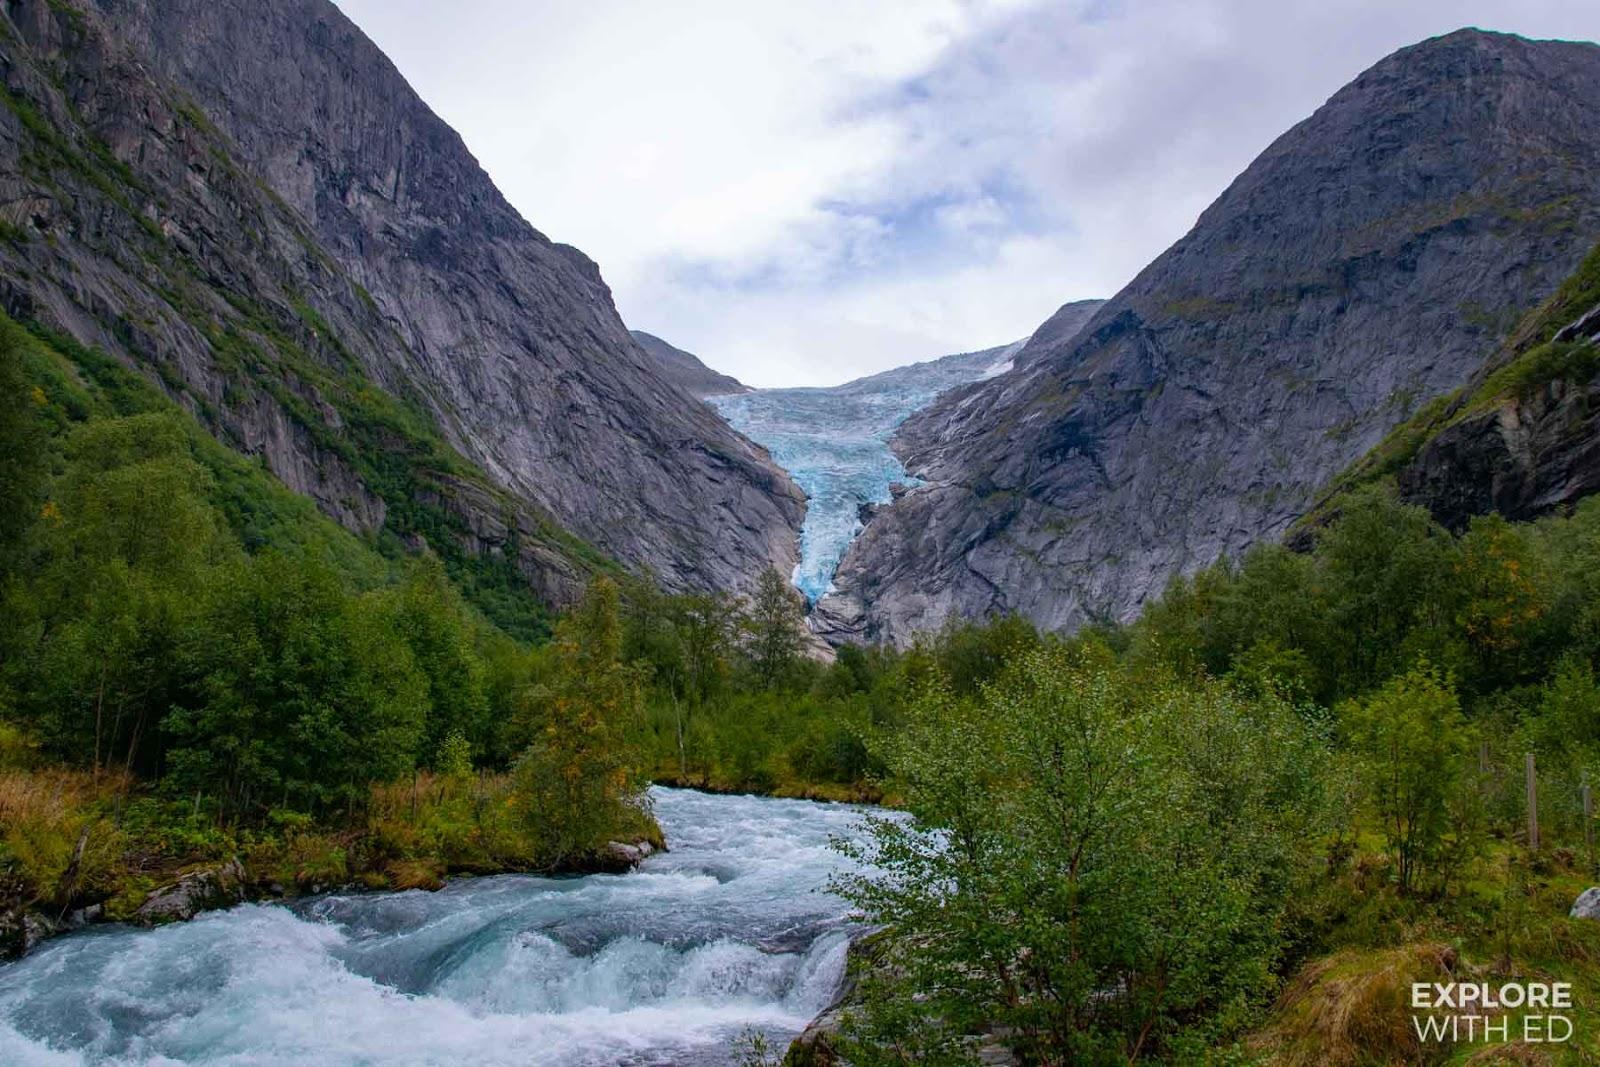 Briksdal Glacier and river